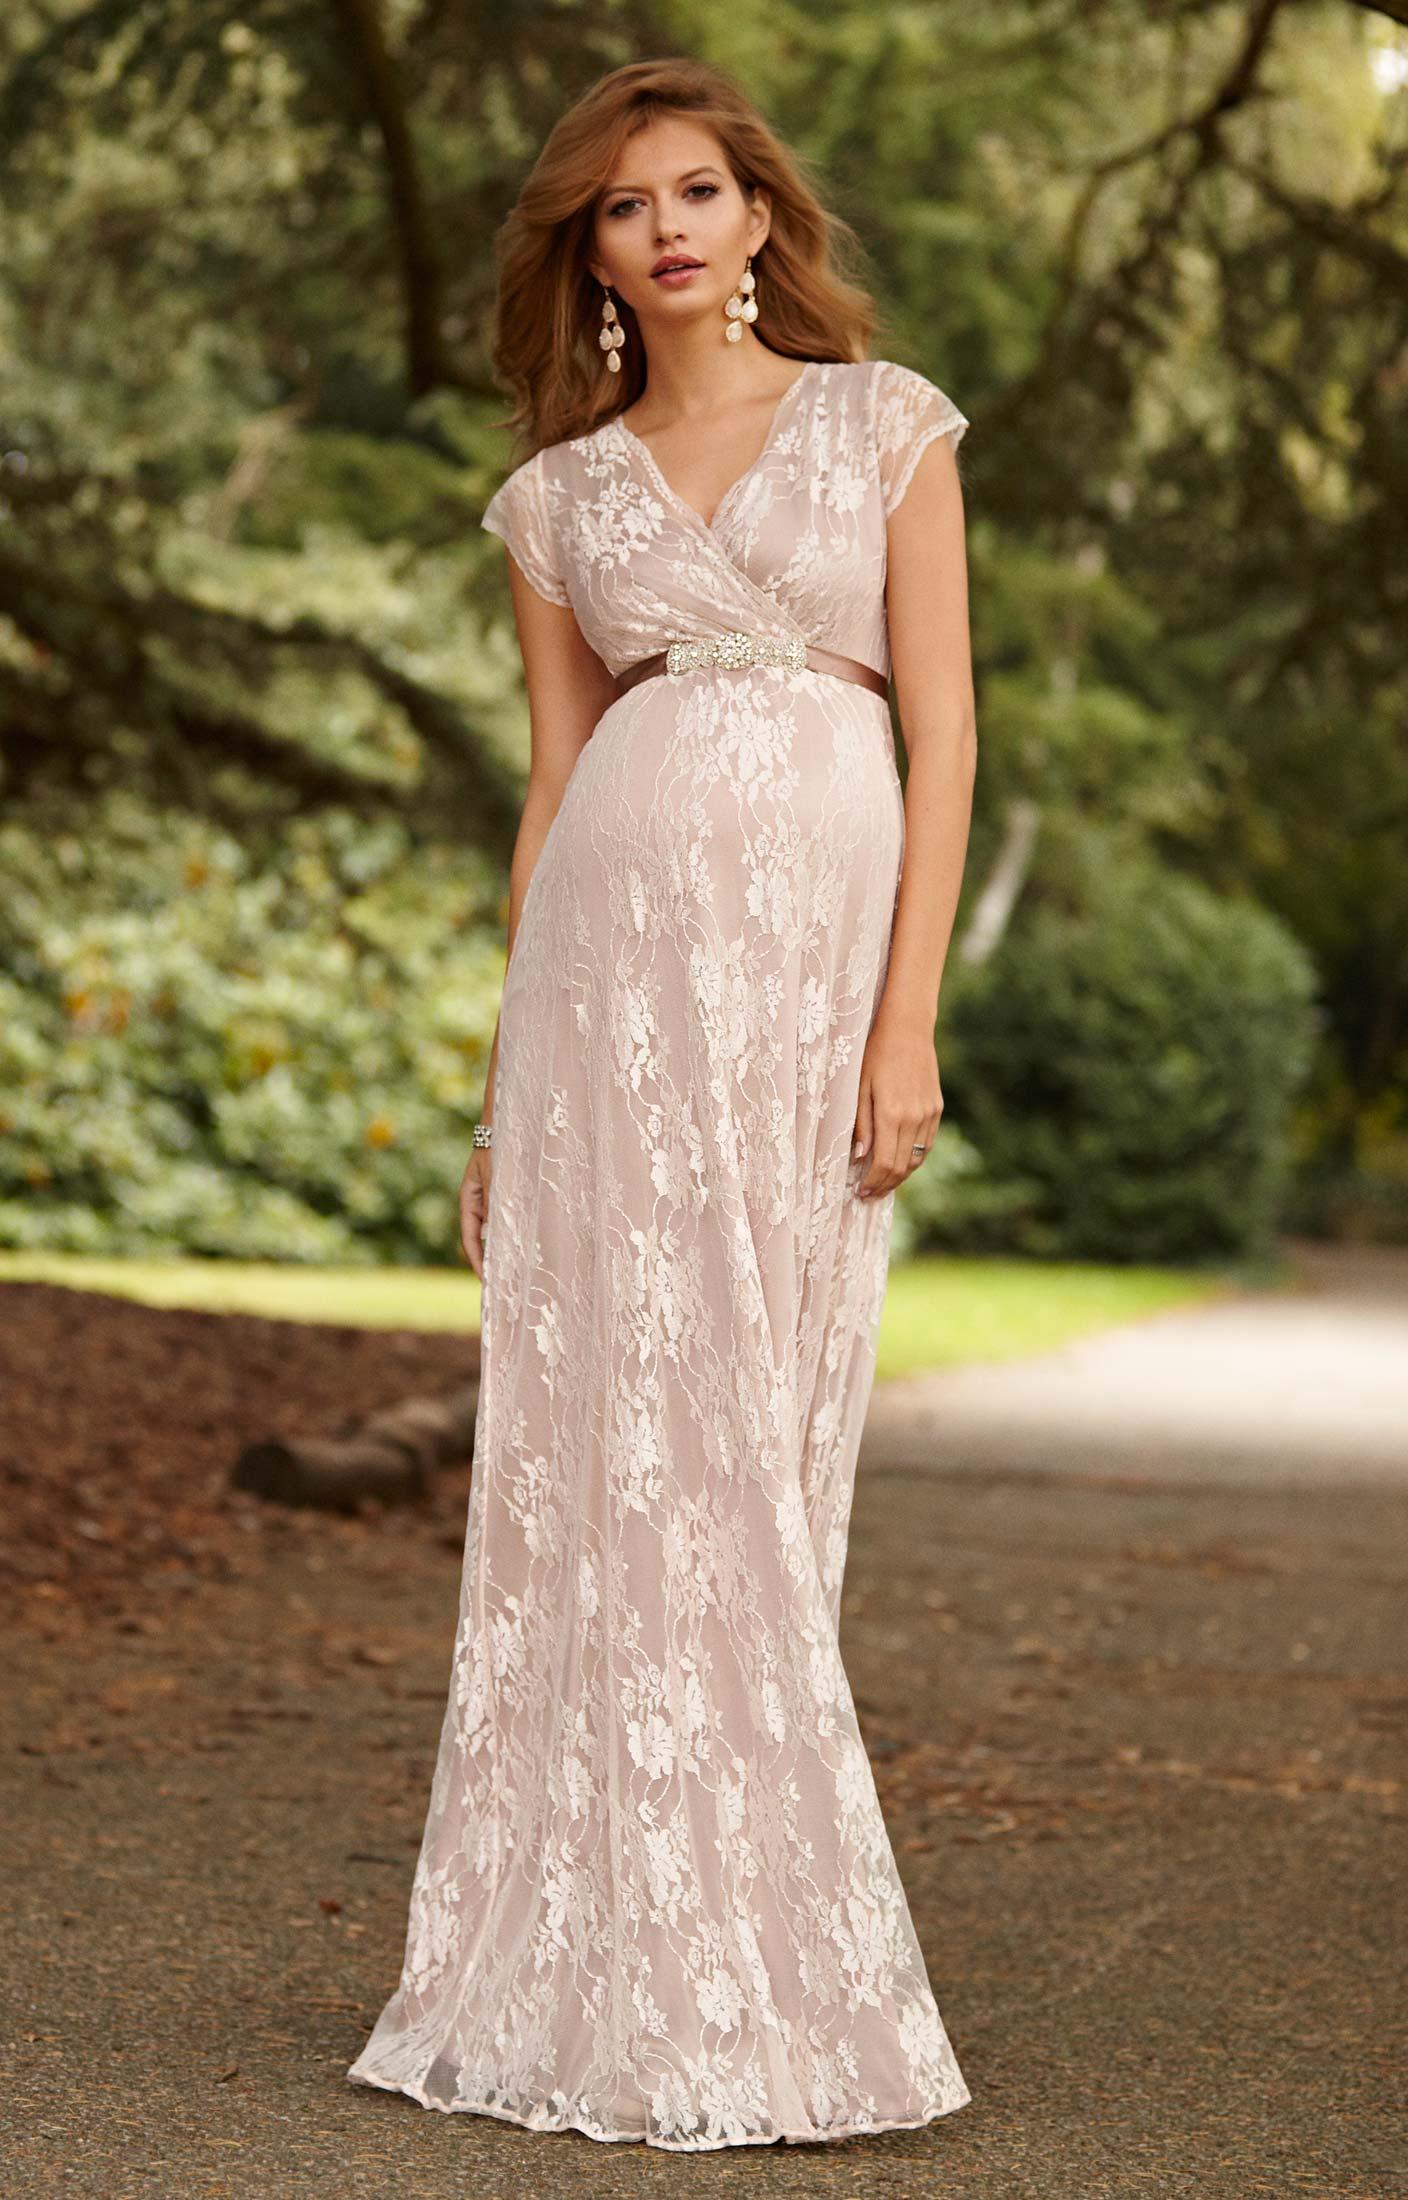 blush wedding dresses photo - 1